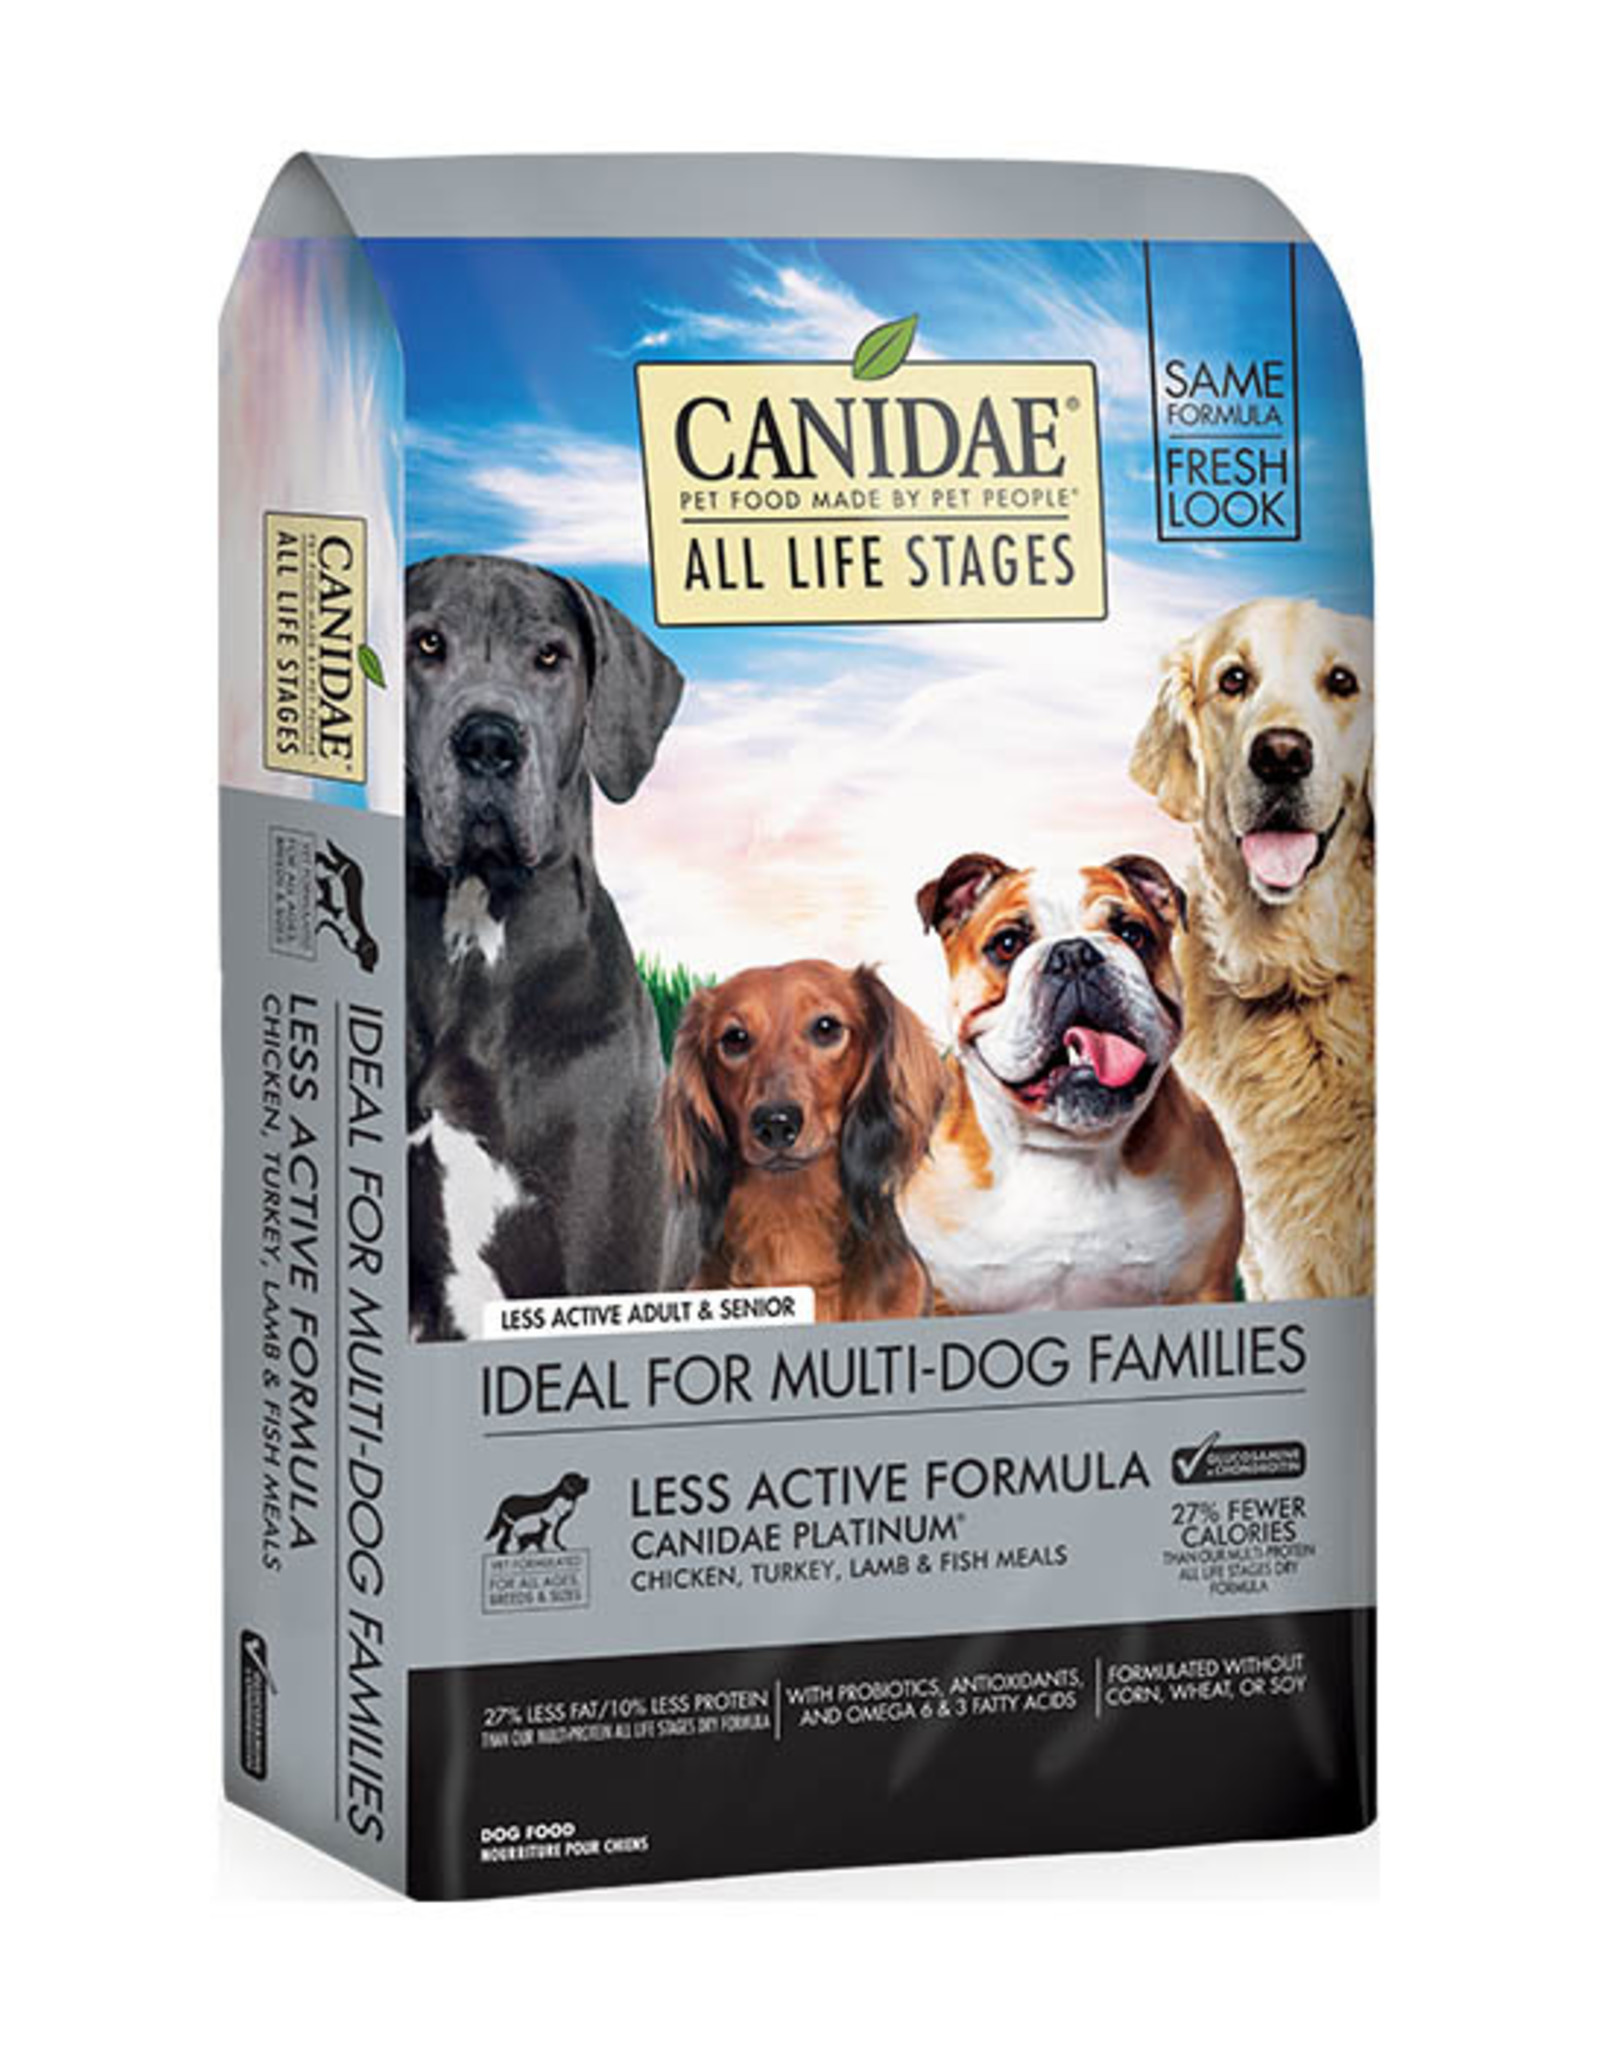 Canidae CANIDAE Platinum 15#